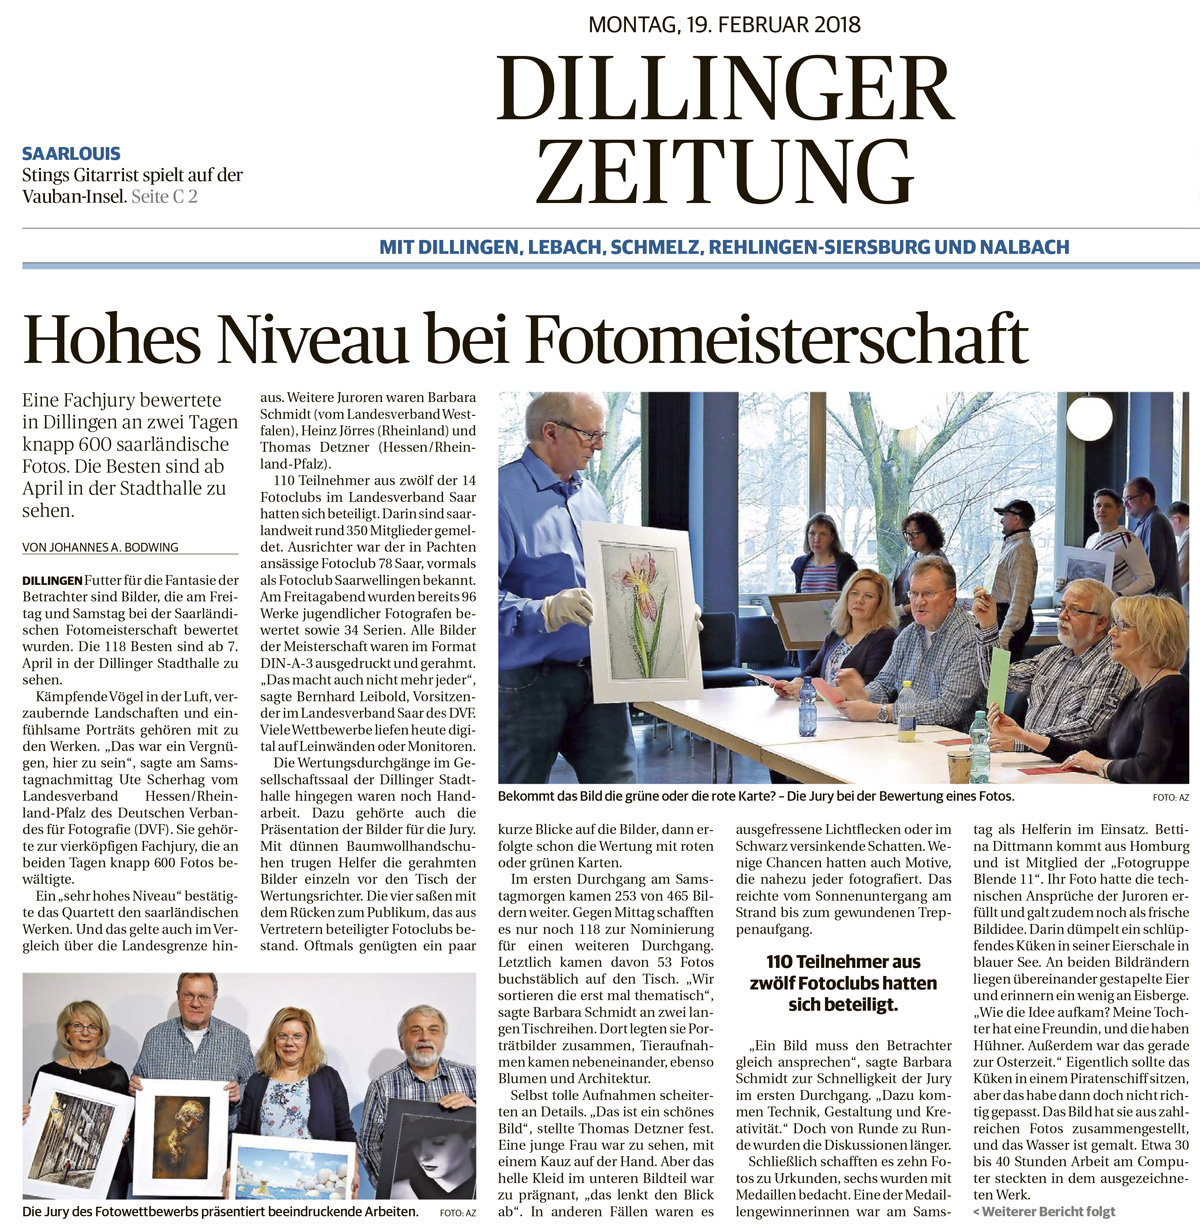 Dillinger Zeitung 19.02.2018